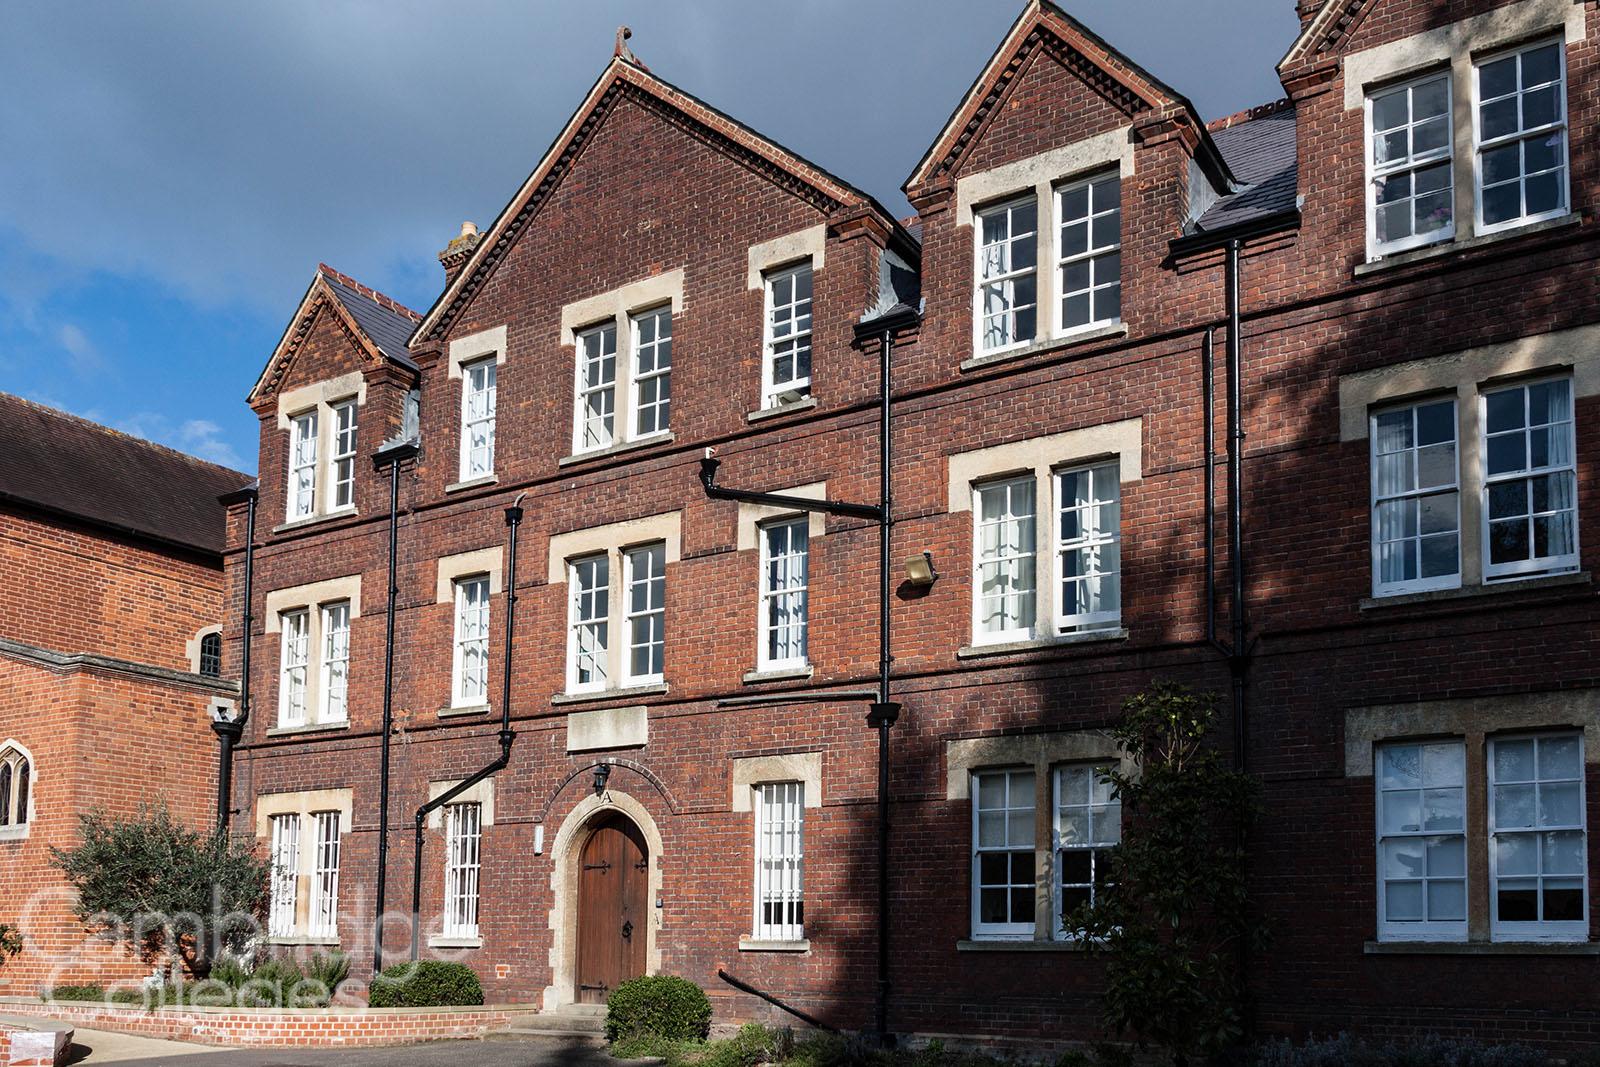 The Norfolk building of St Edmund's